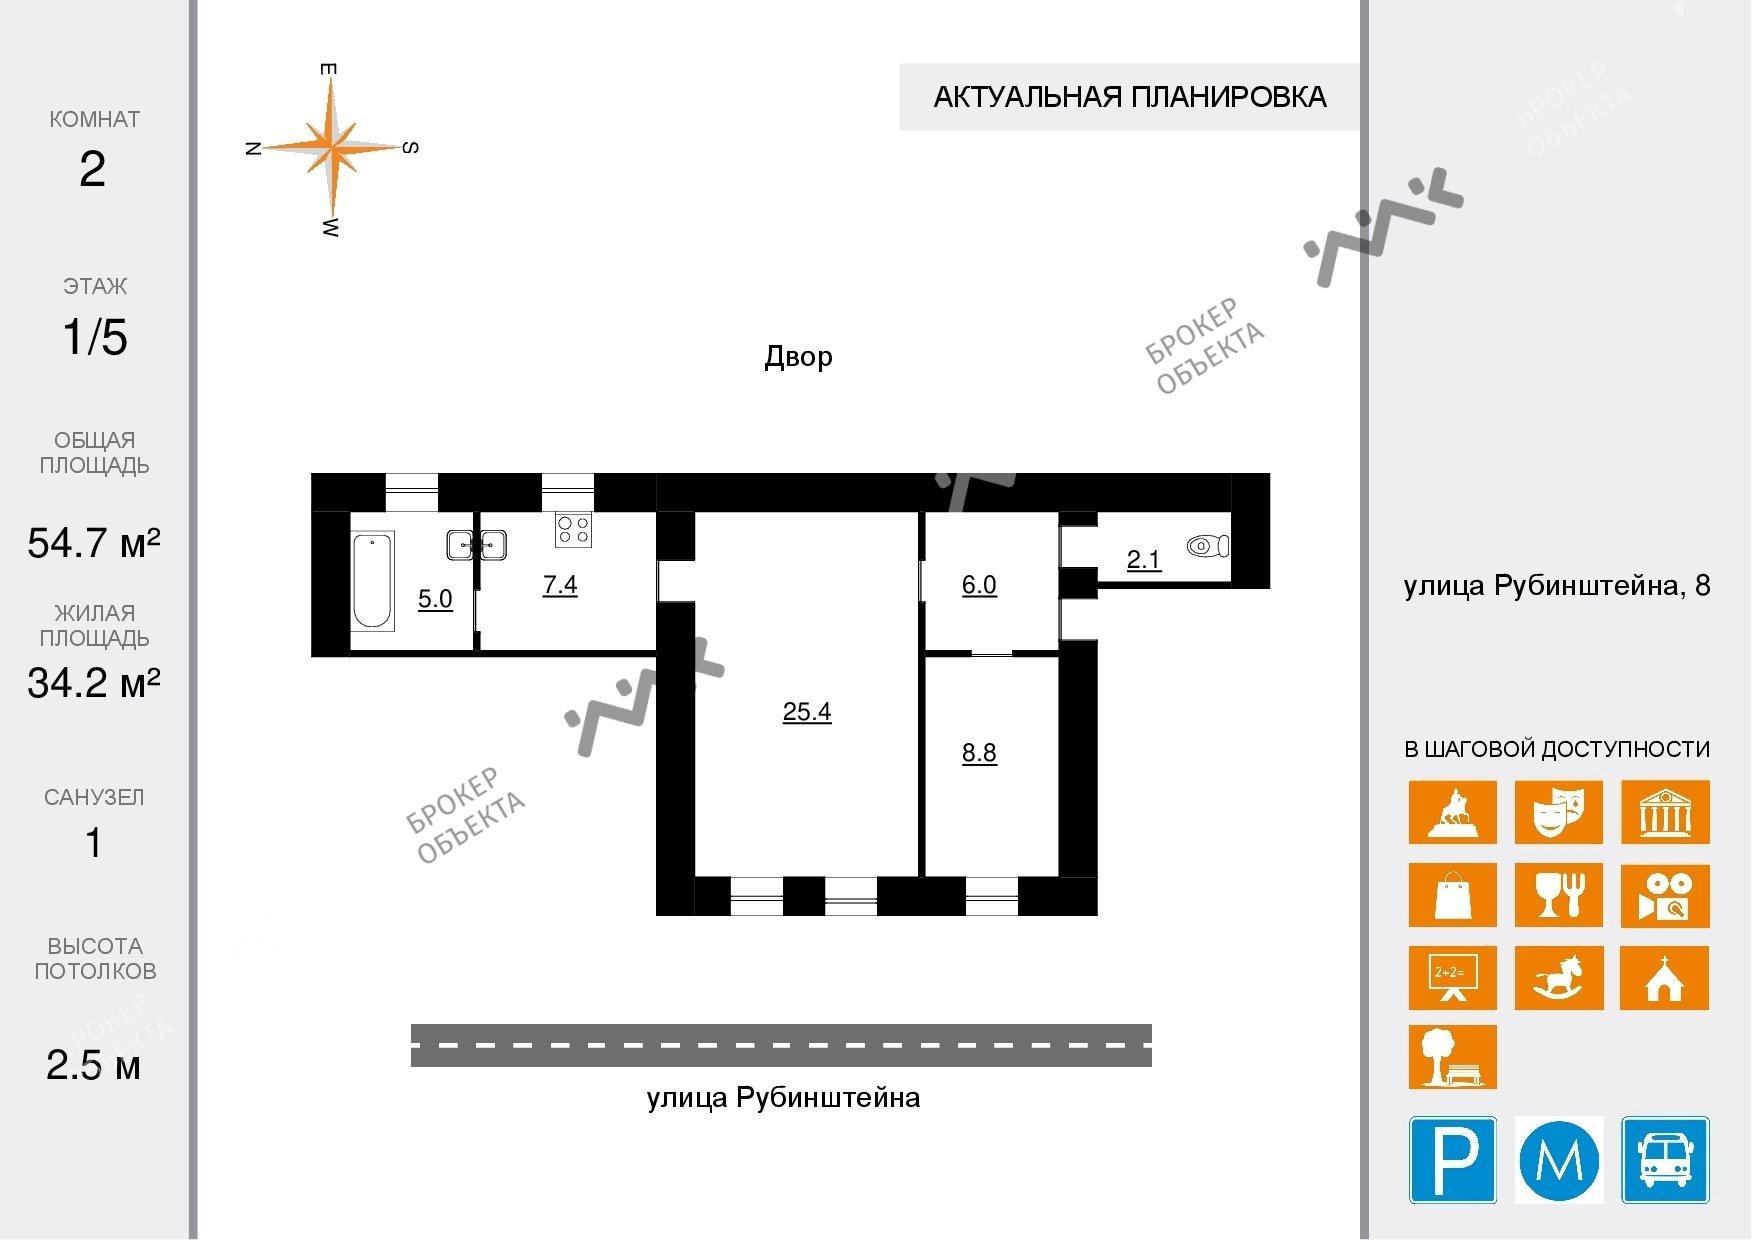 Планировка Рубинштейна ул., д.8. Лот № 15156685